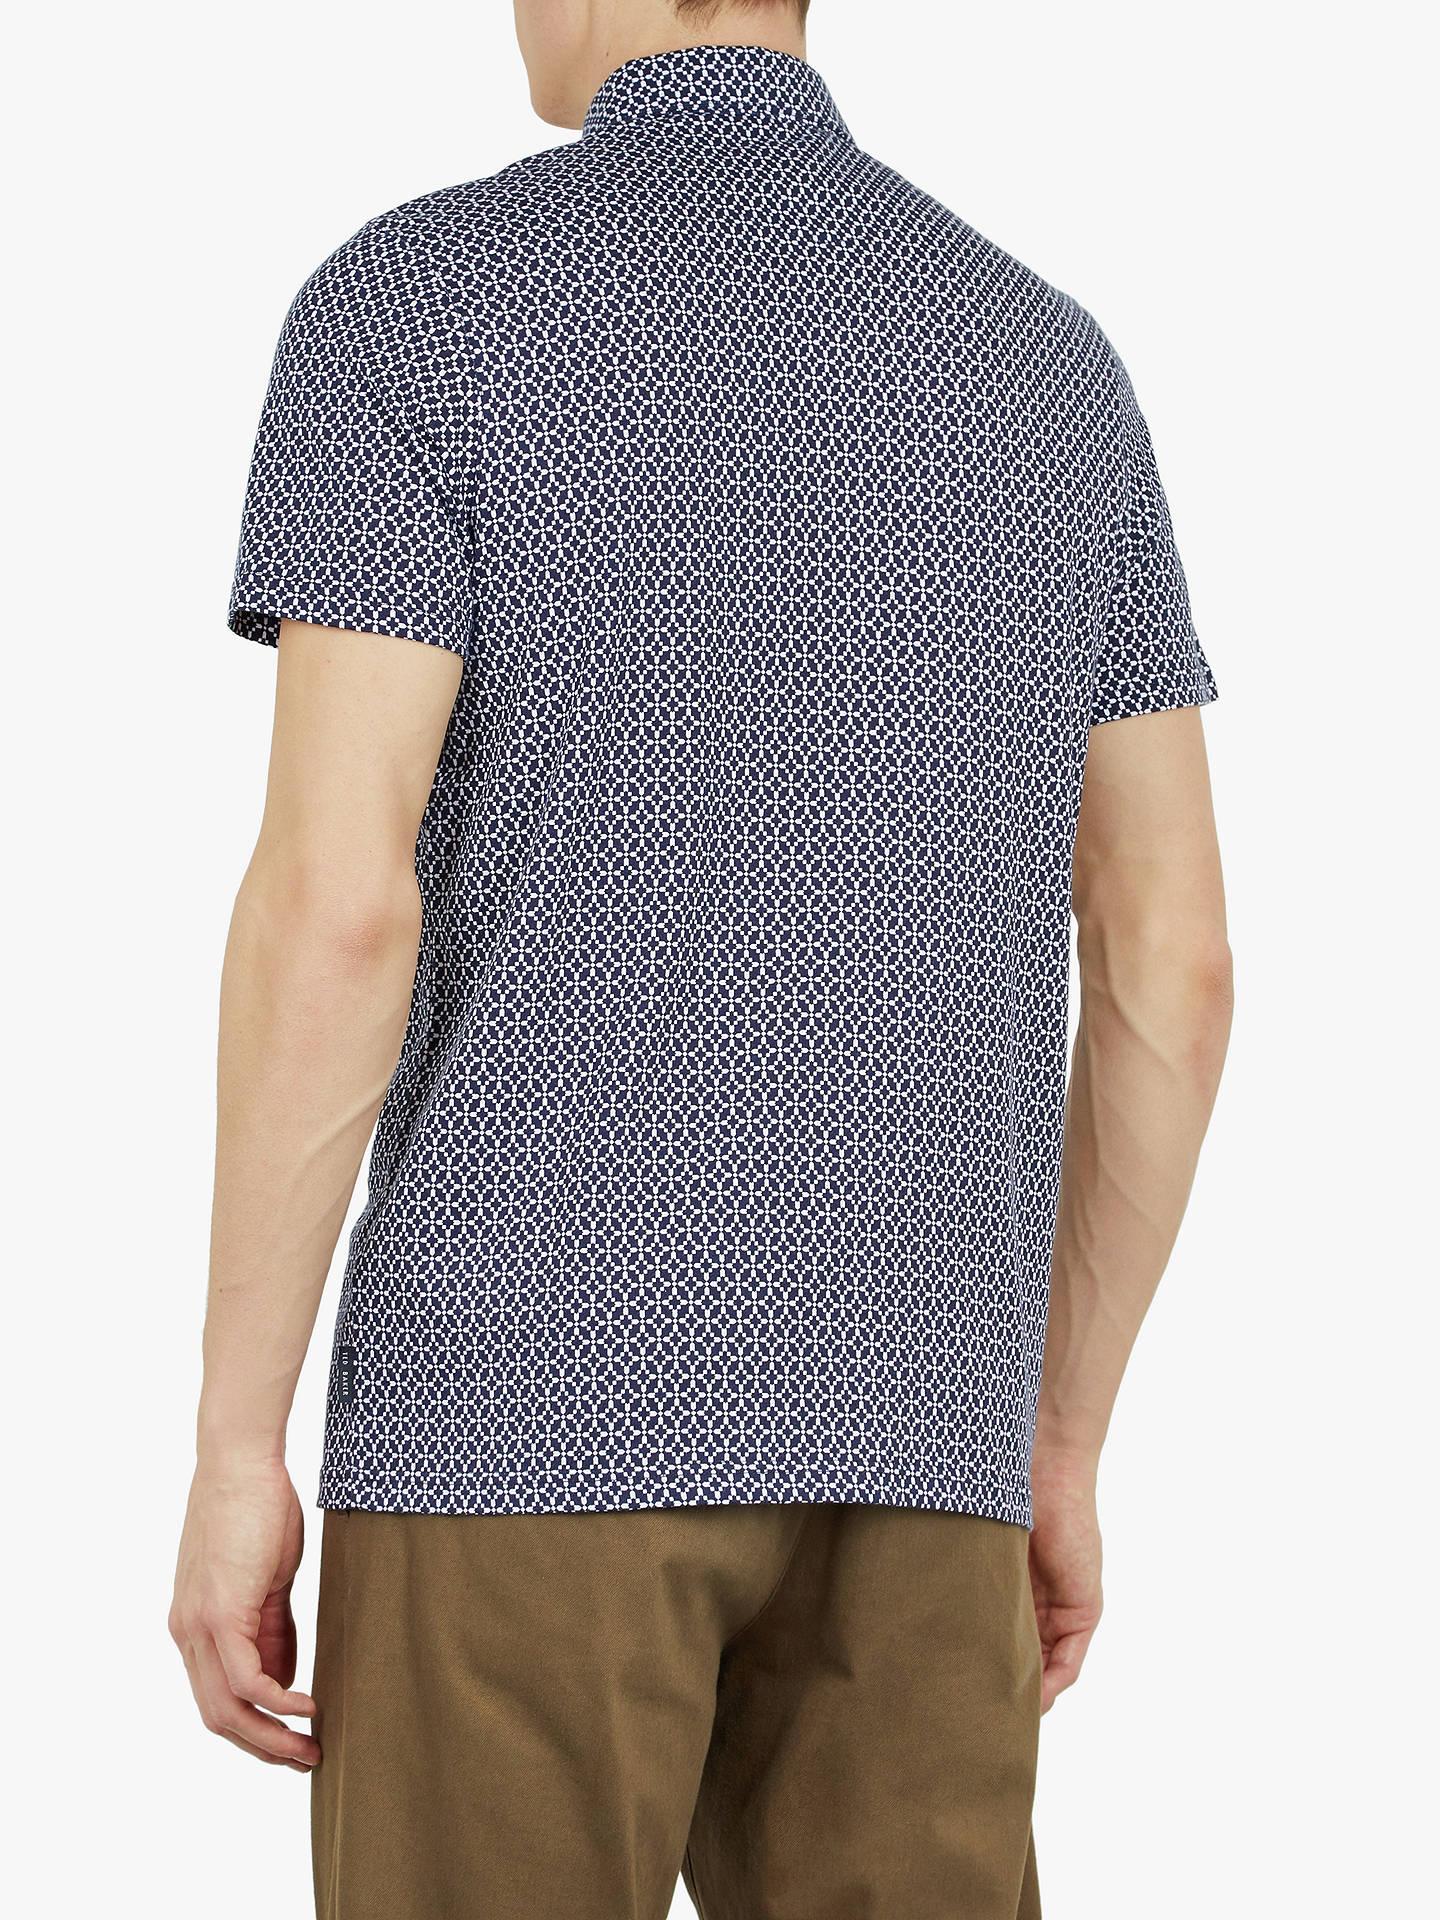 cc697c6d5 Ted Baker Badant Short Sleeve Geometric Print Polo Shirt at John ...